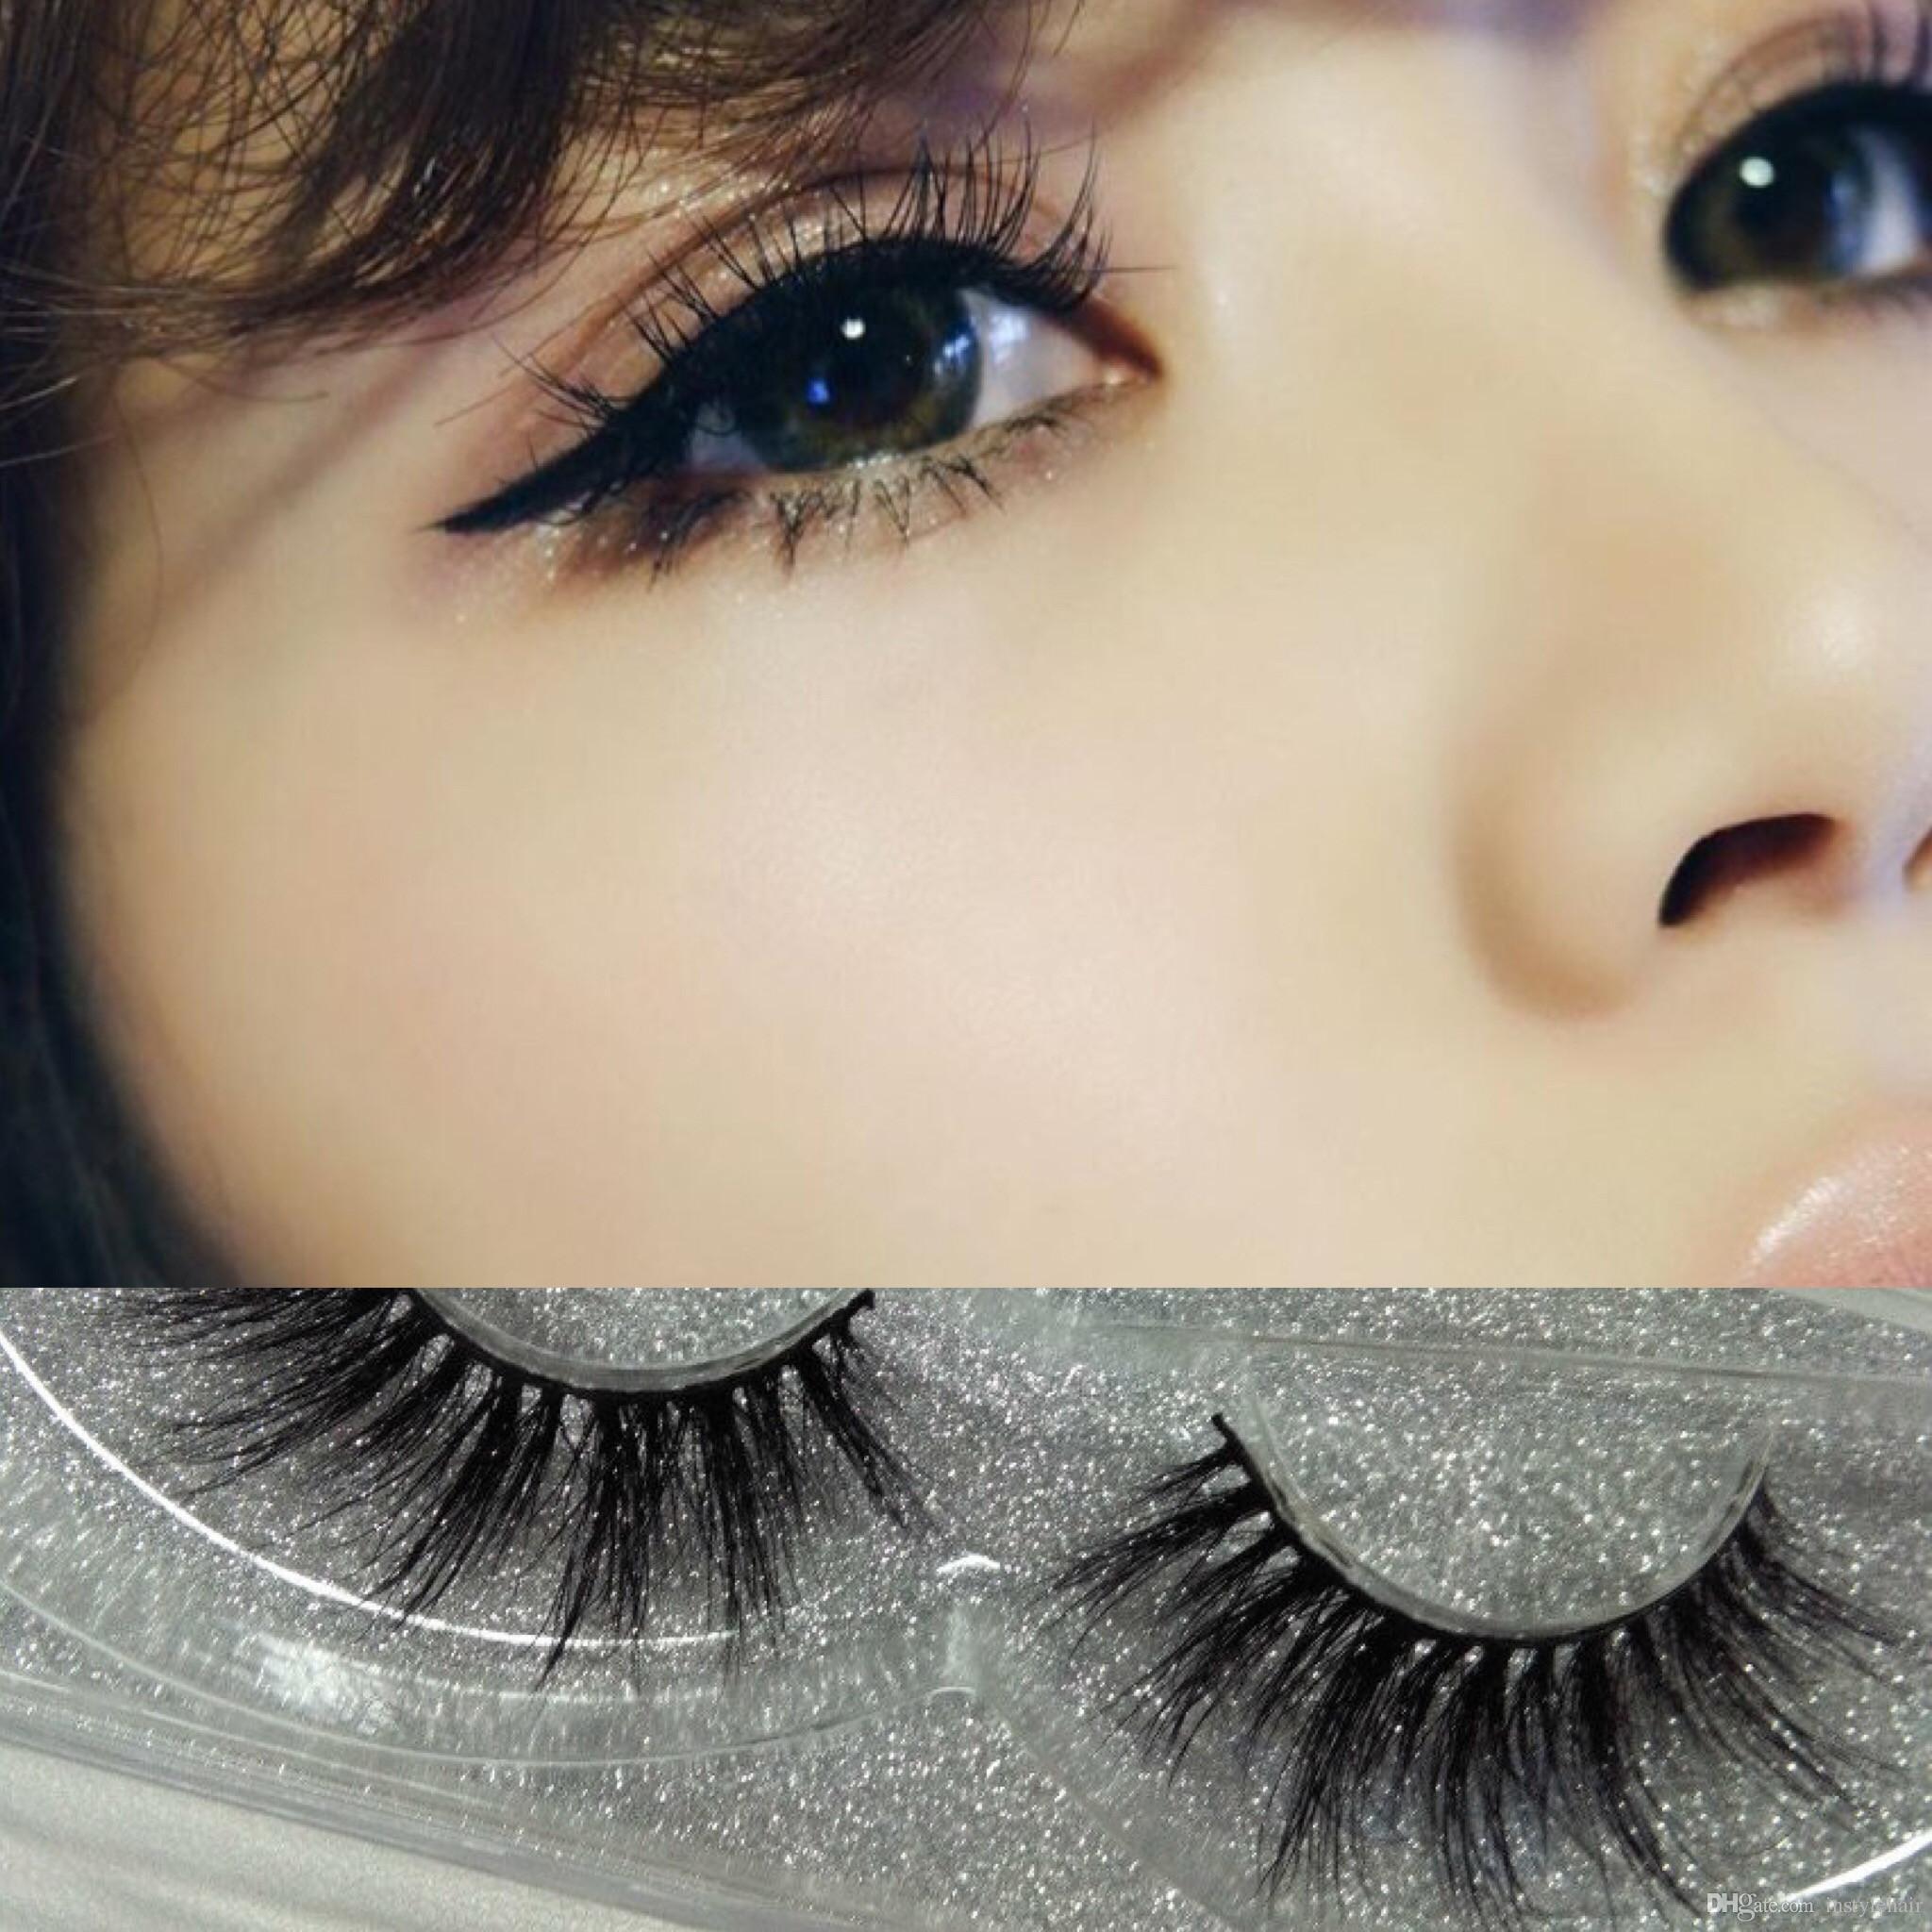 10pairs Beauty 3D MINK False Eyelashes Messy Cross Thick Natural Fake Eye Lashes Professional Makeup Eye Lashes Handmade